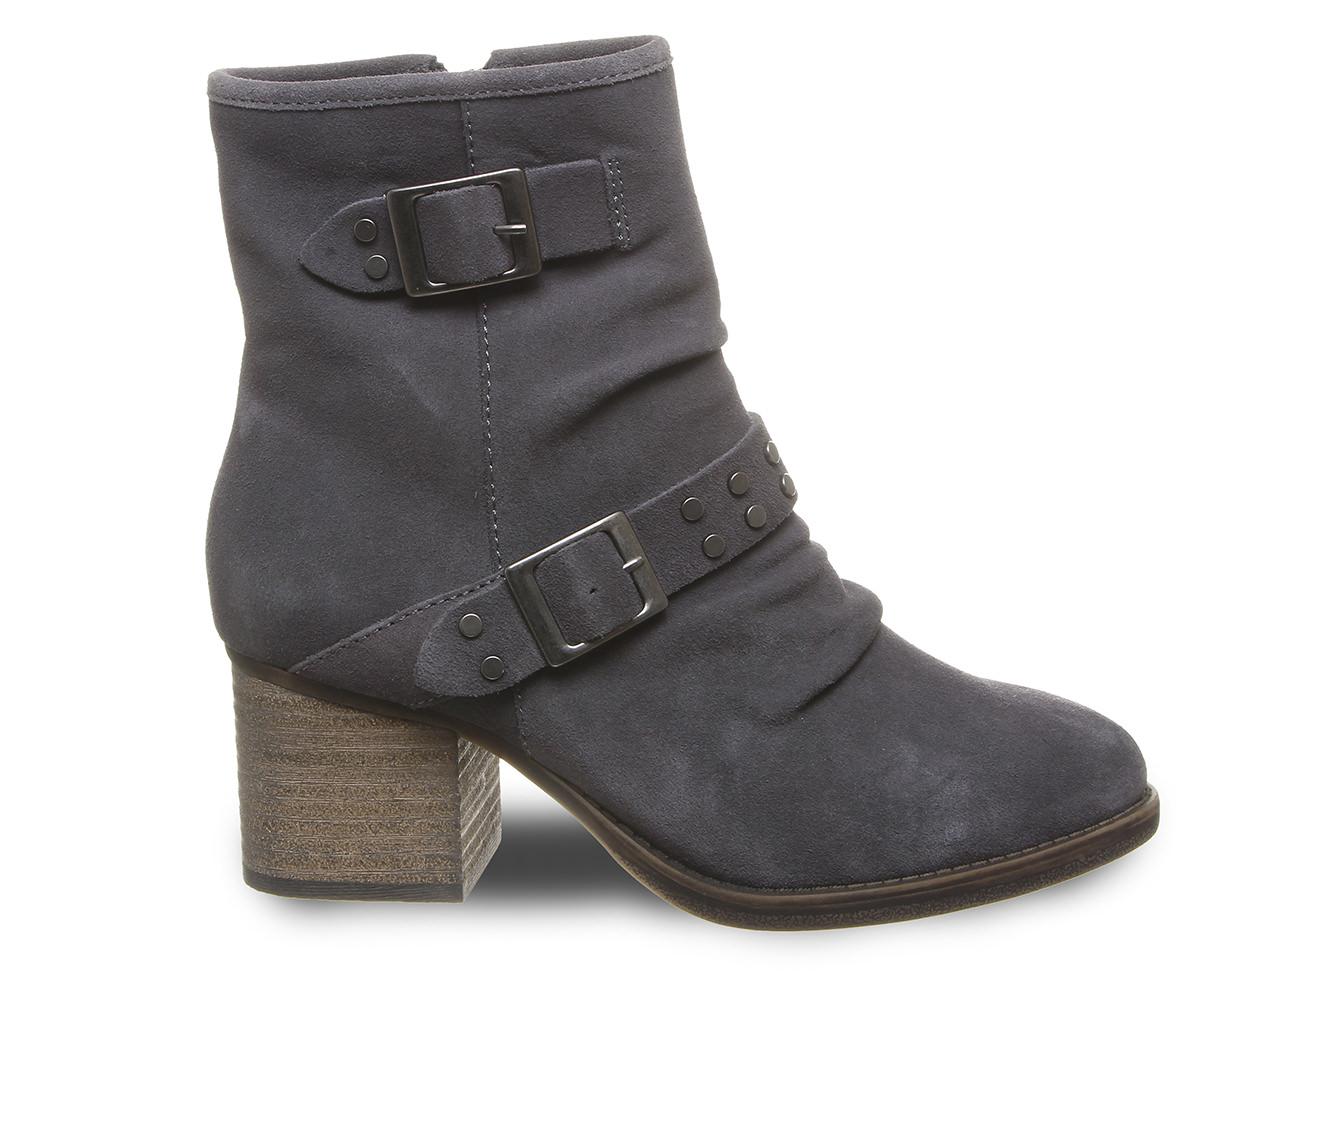 Bearpaw Amethyst Women's Boot (Gray Suede)